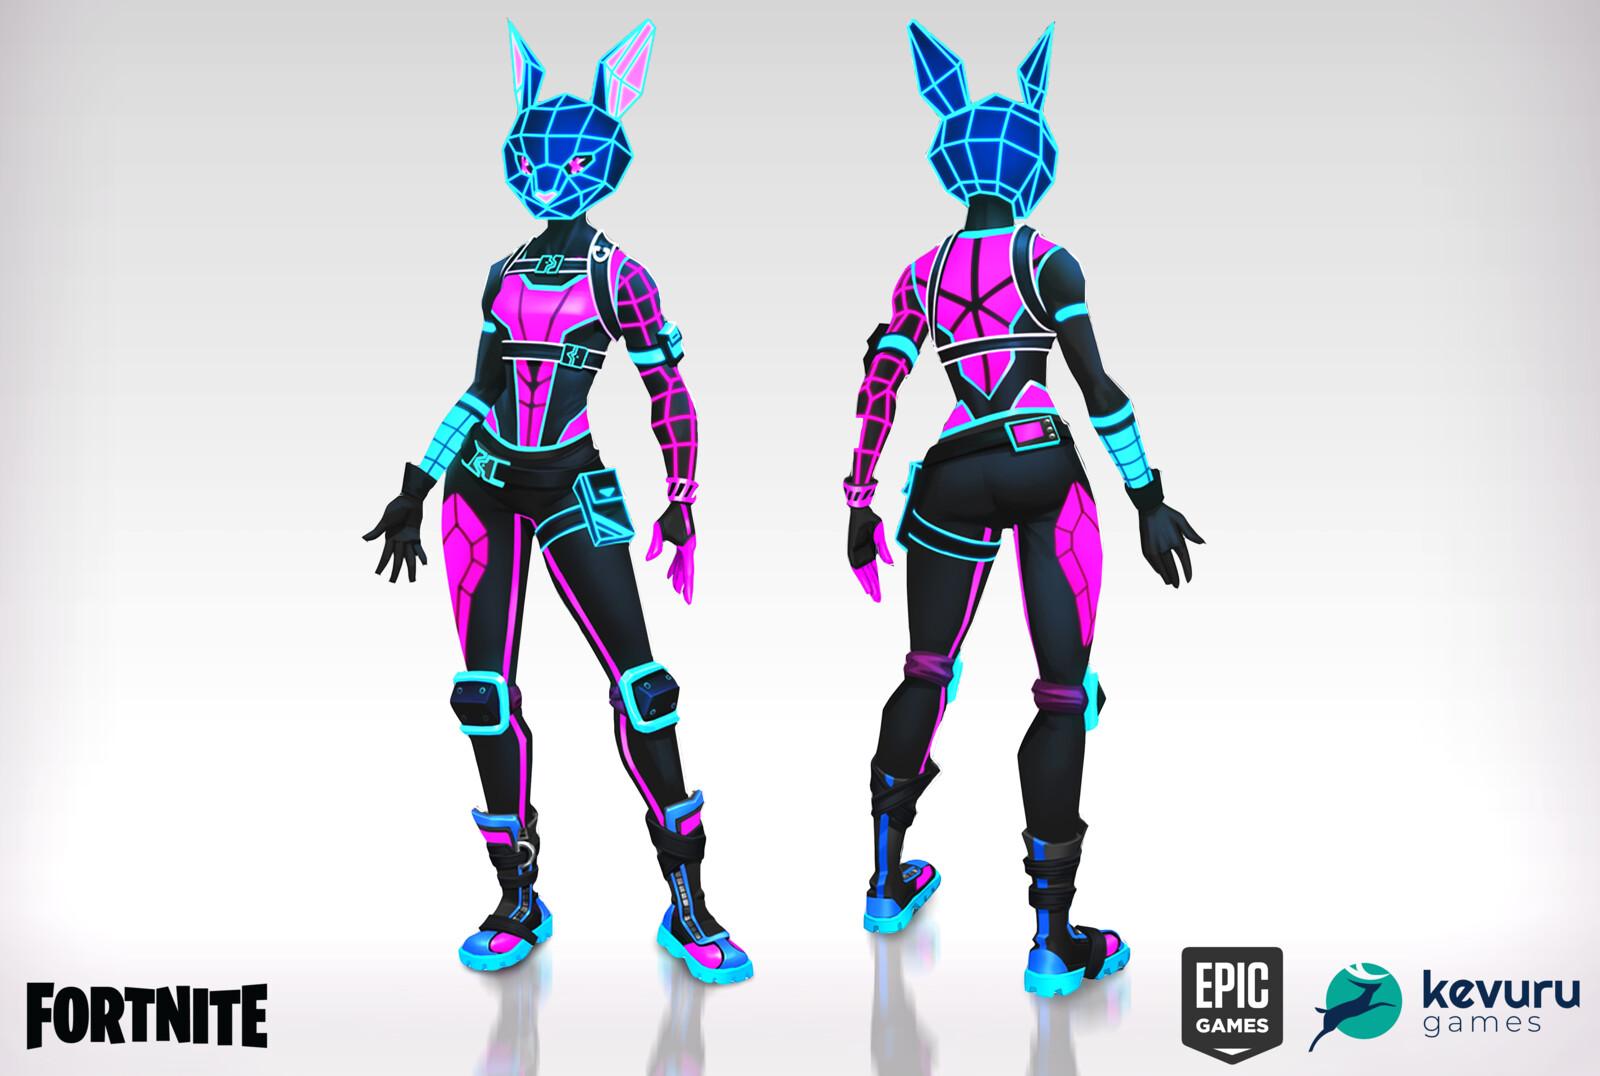 Fortnite Bunnywolf Concept Art